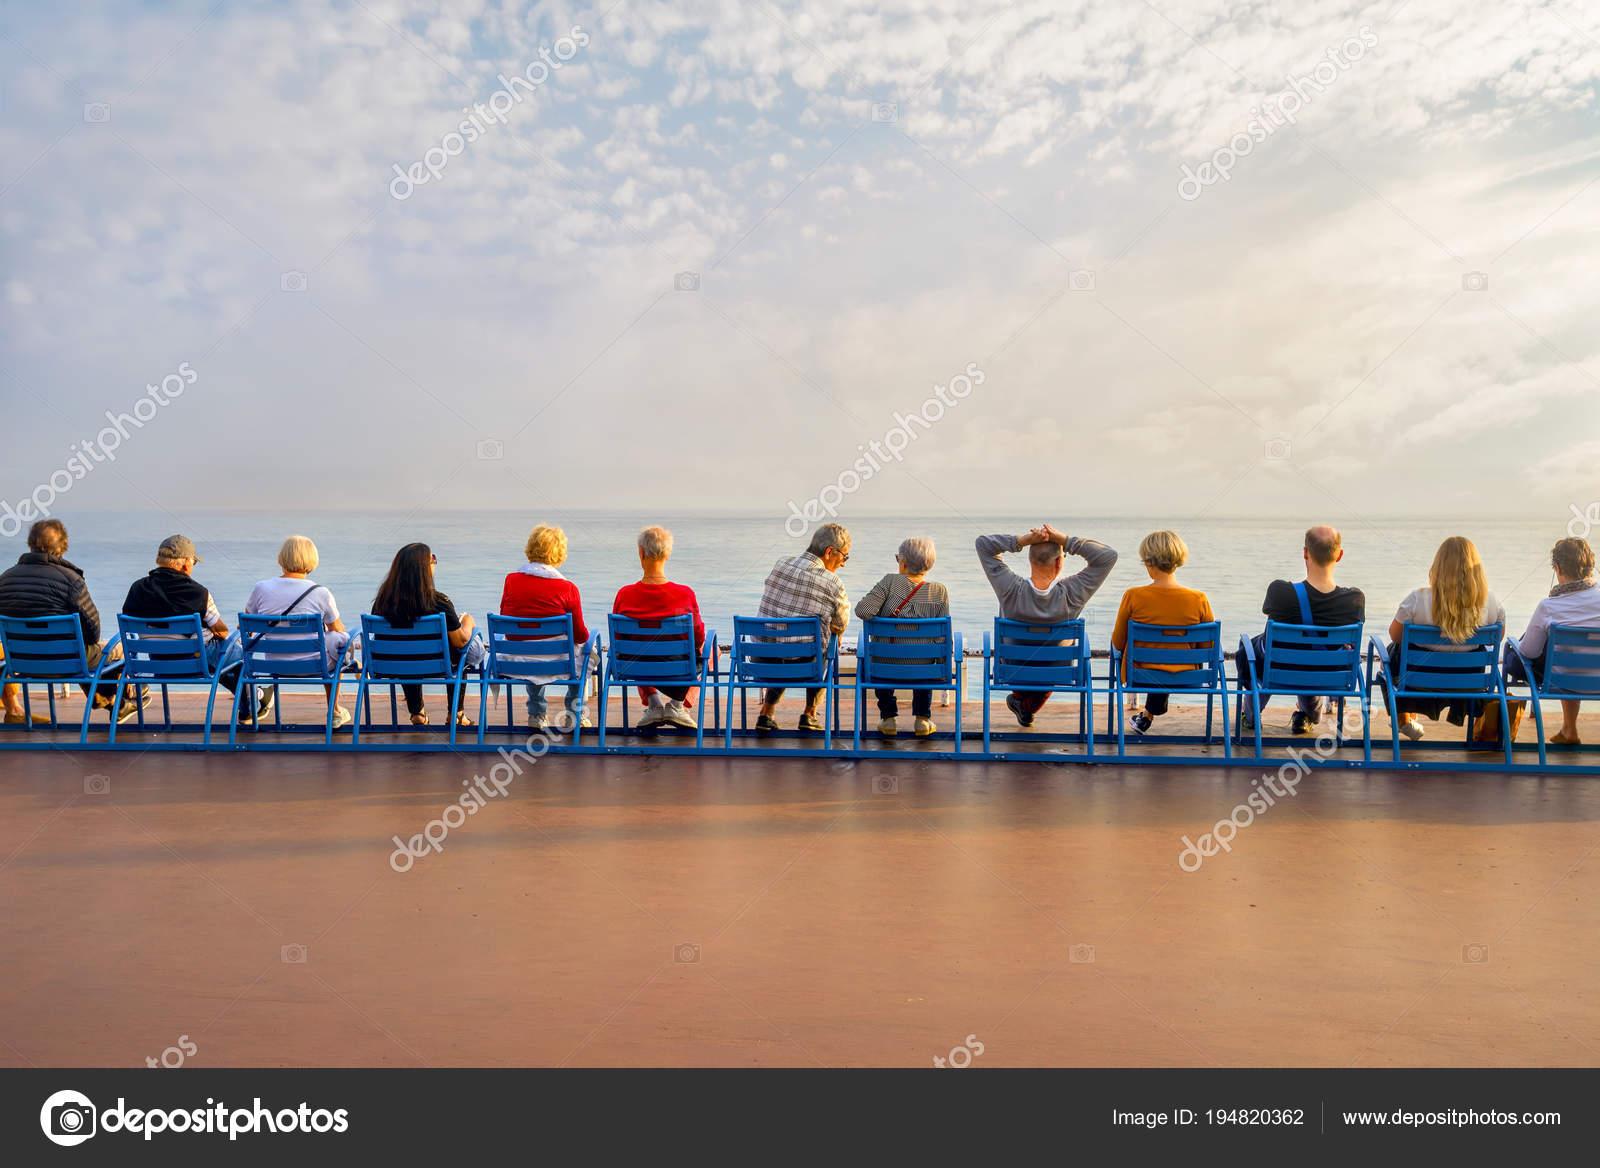 Sedie Blu Nizza : Nizza francia ottobre foto moda stile gente seduta sulle